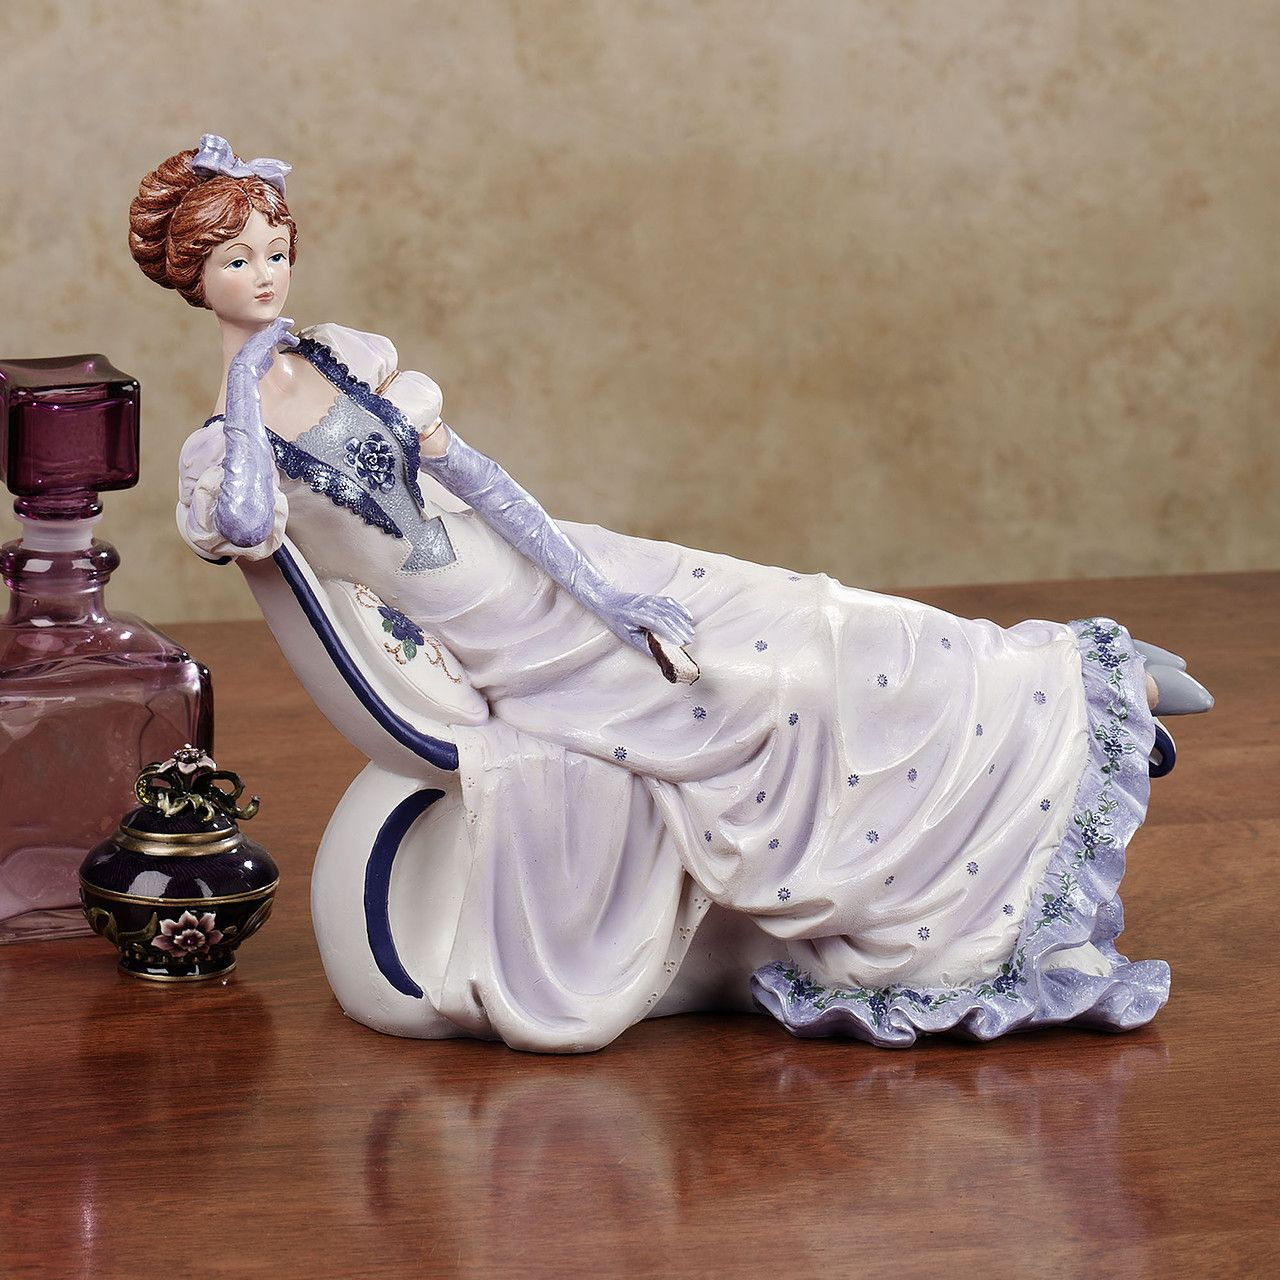 картинки с фарфоровыми статуэтками того, хозяйка